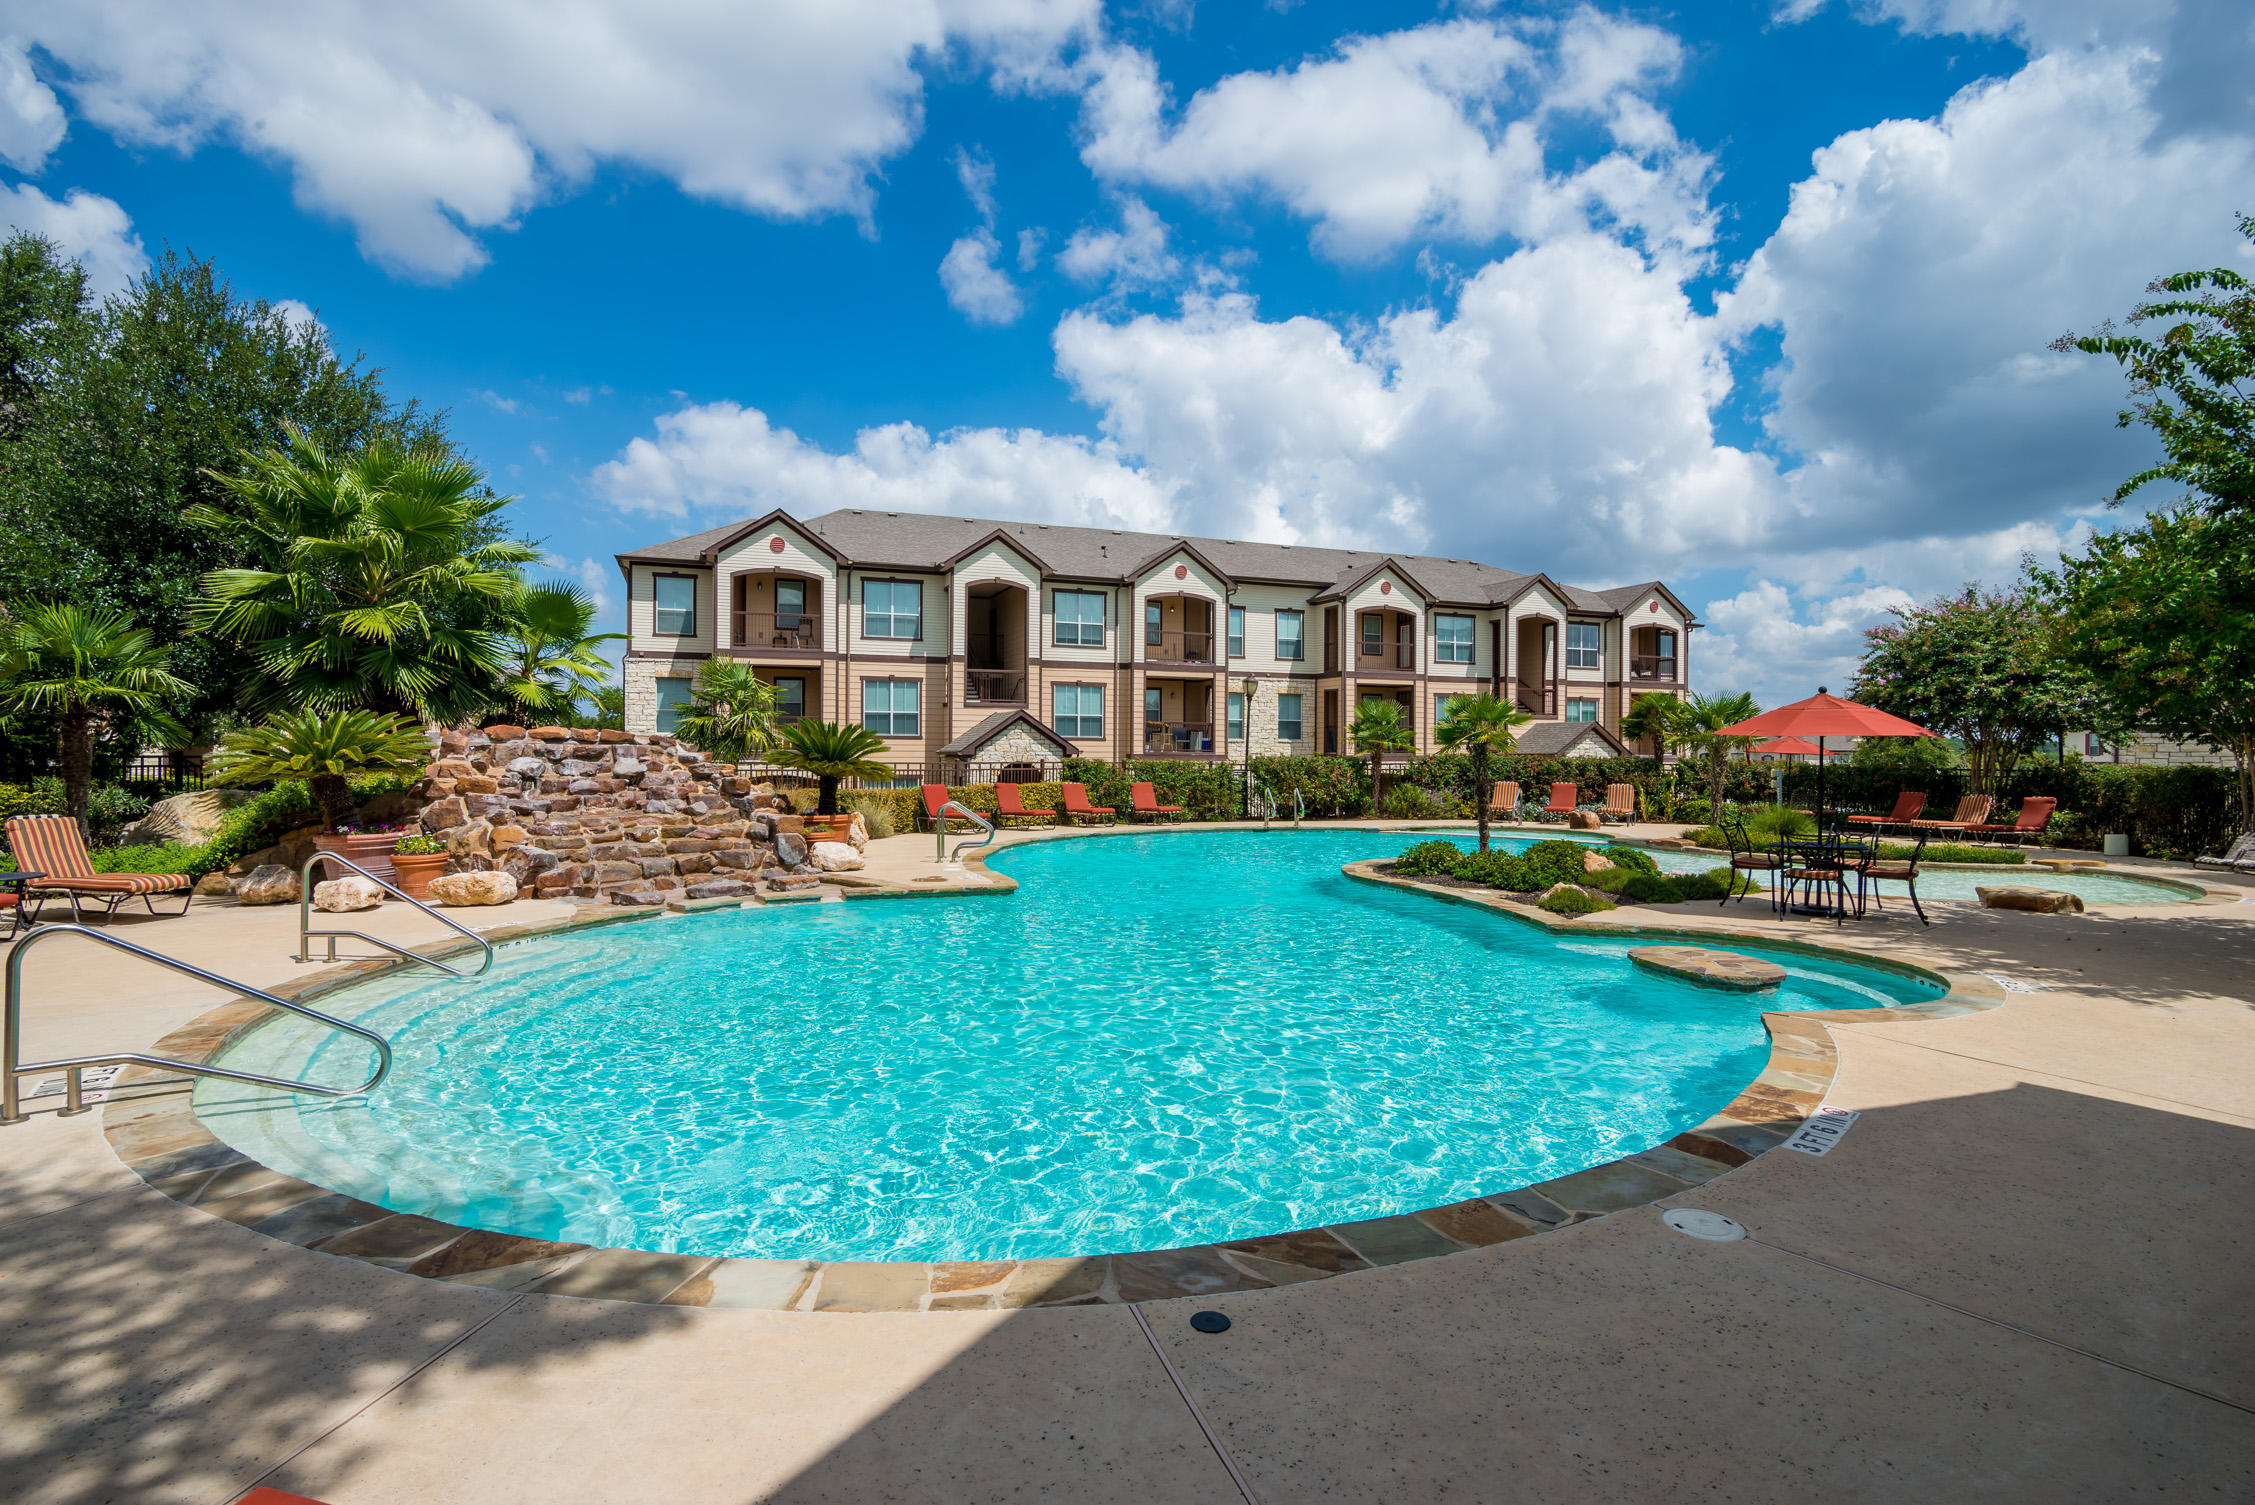 Boulder creek apartment homes san antonio texas for Apartment pool